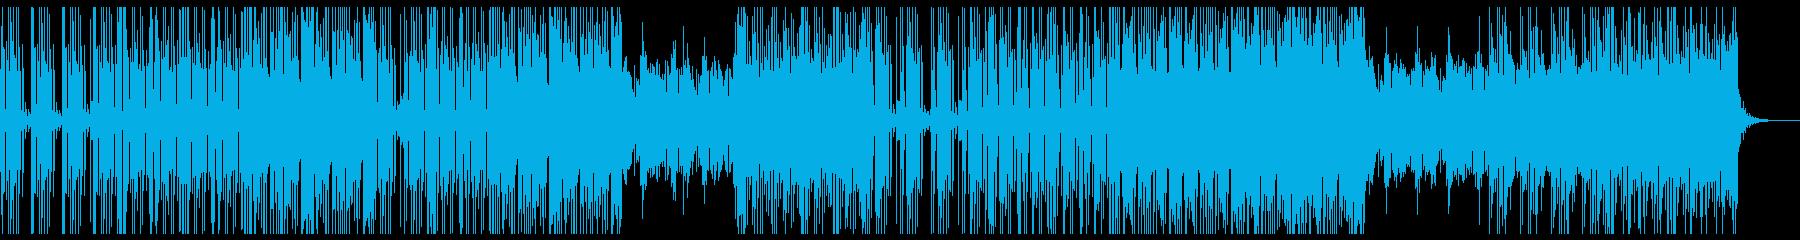 100BPM・Electro・DnBの再生済みの波形